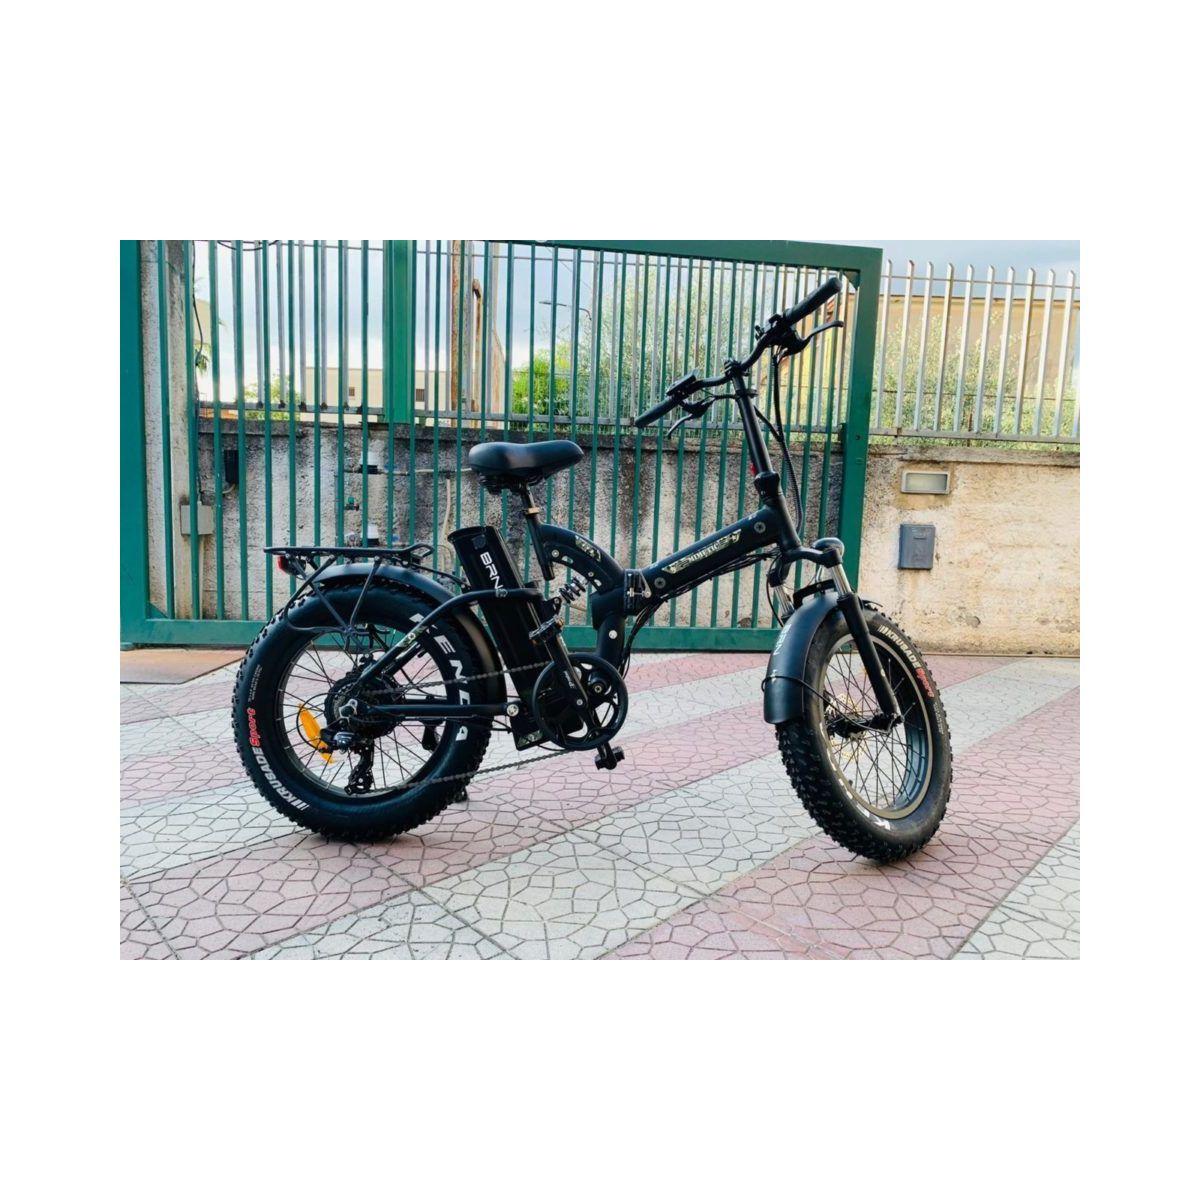 Fat Bike E-Bike 20′ Bicicletta Bici pieghevole elettrica Biammortizzata 500w 48V Nero Militar BRN22